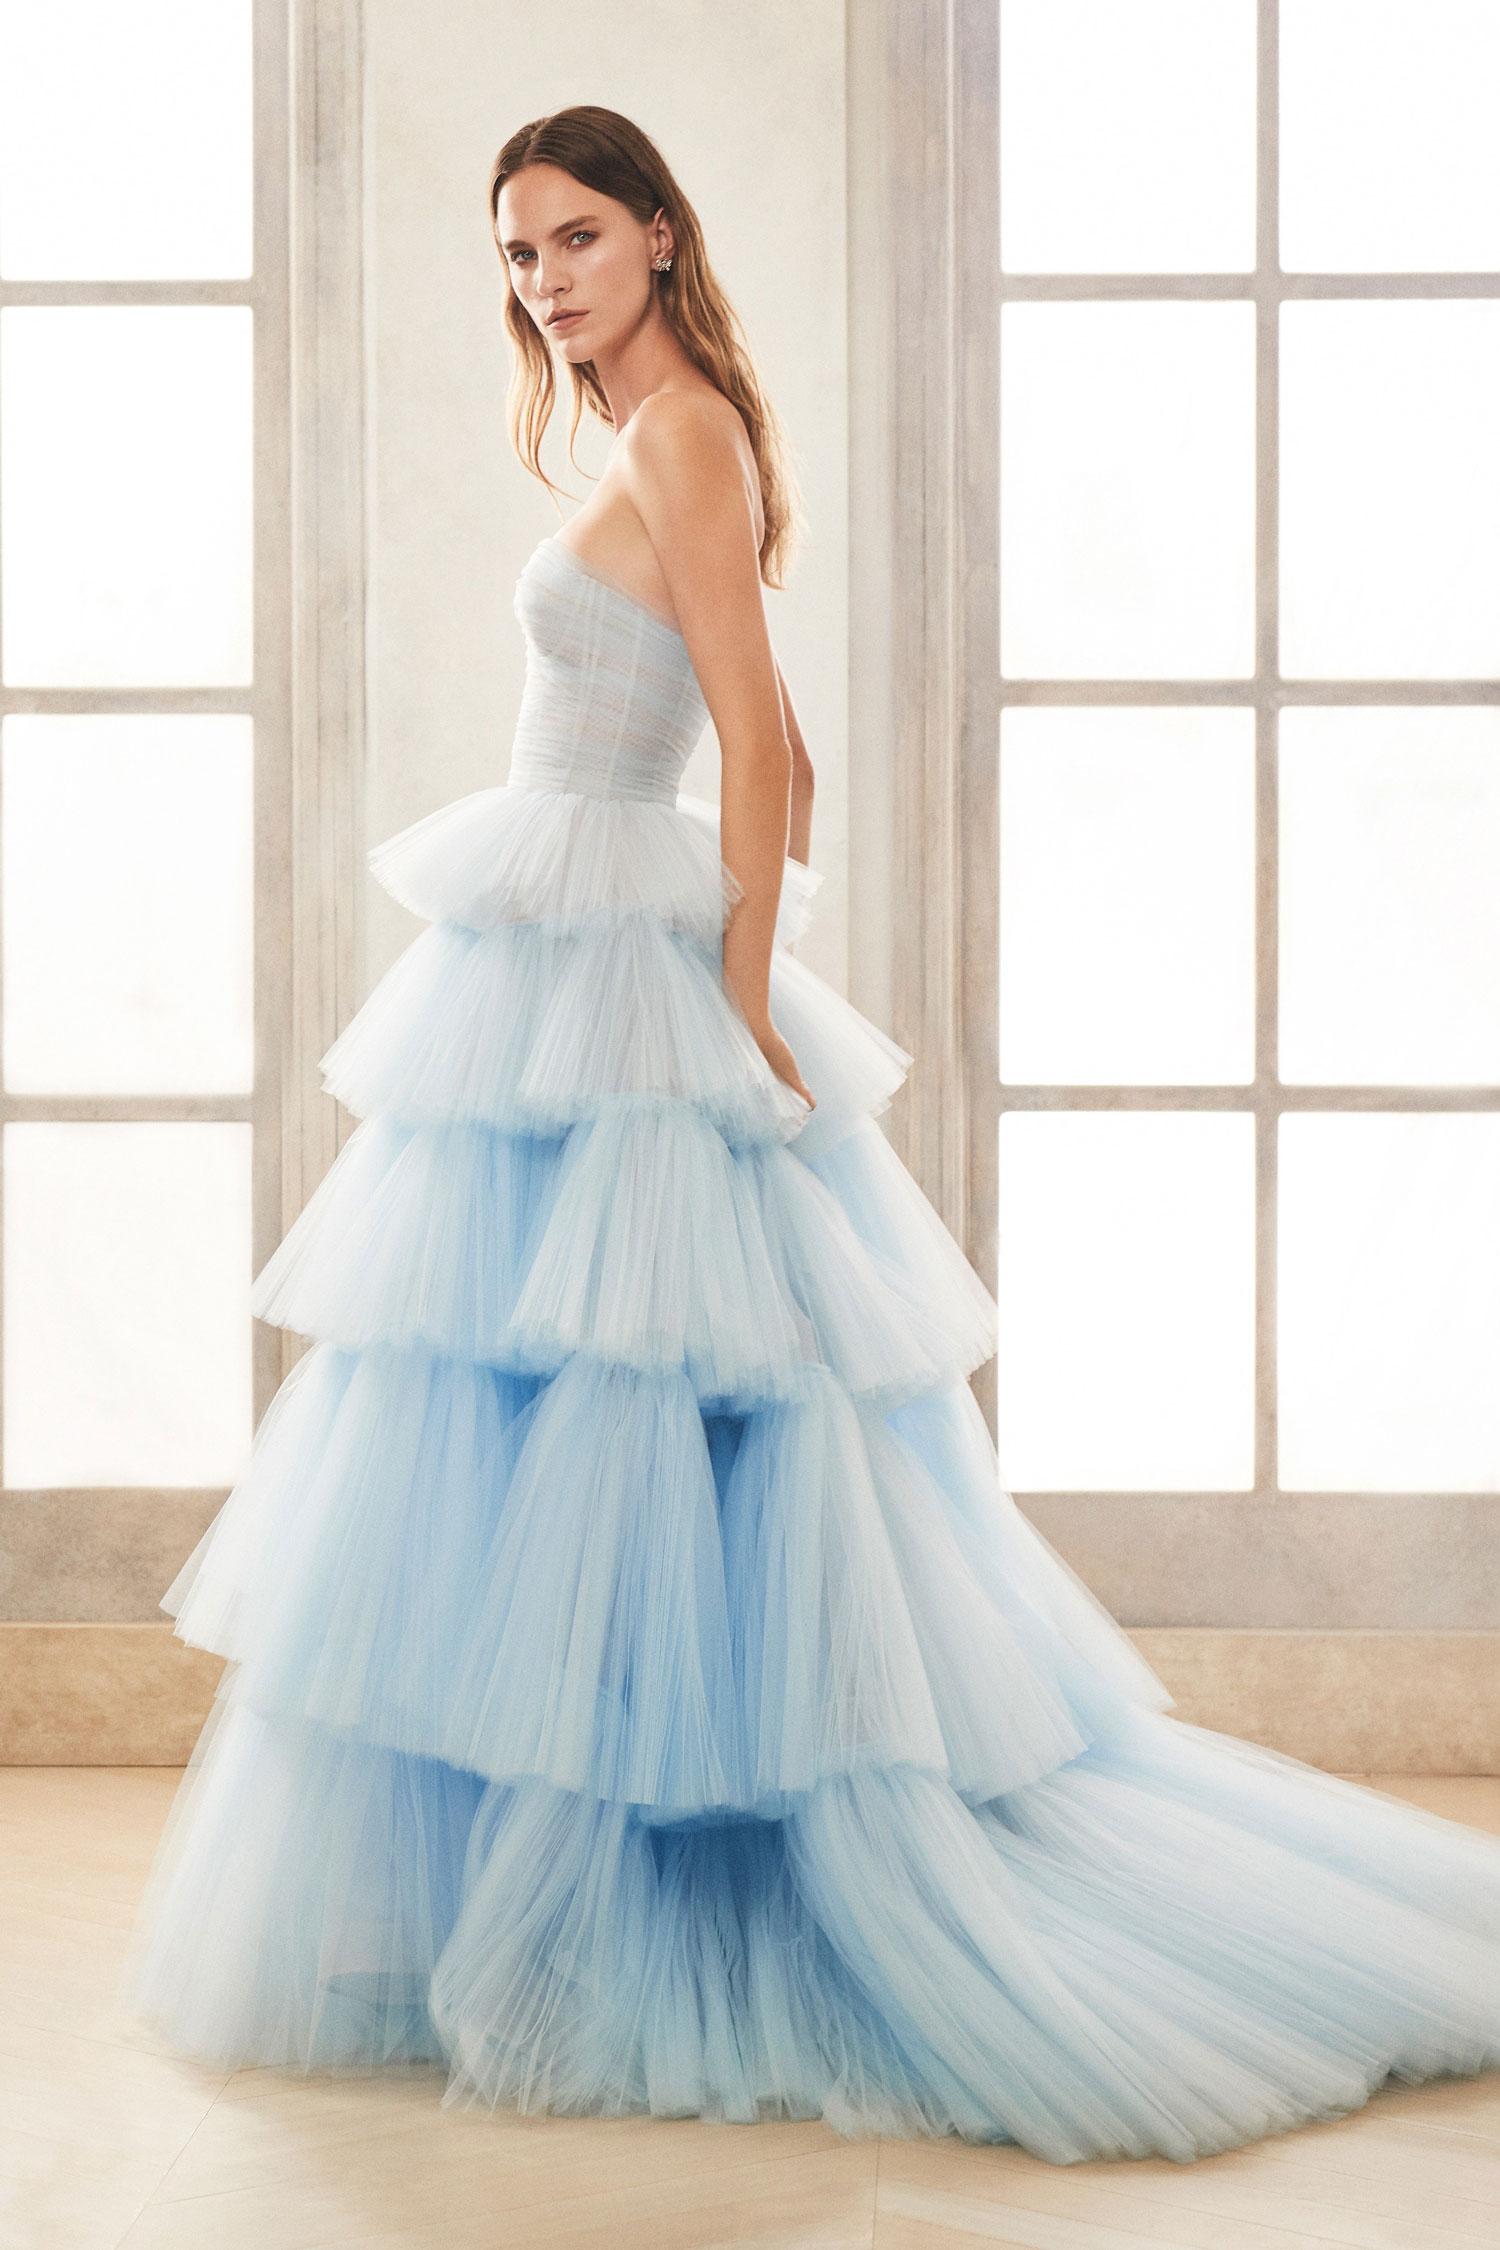 Oscar de la Renta fall 2020 light blue bridal gown tiered skirt wedding ideas carine's bridal atelier